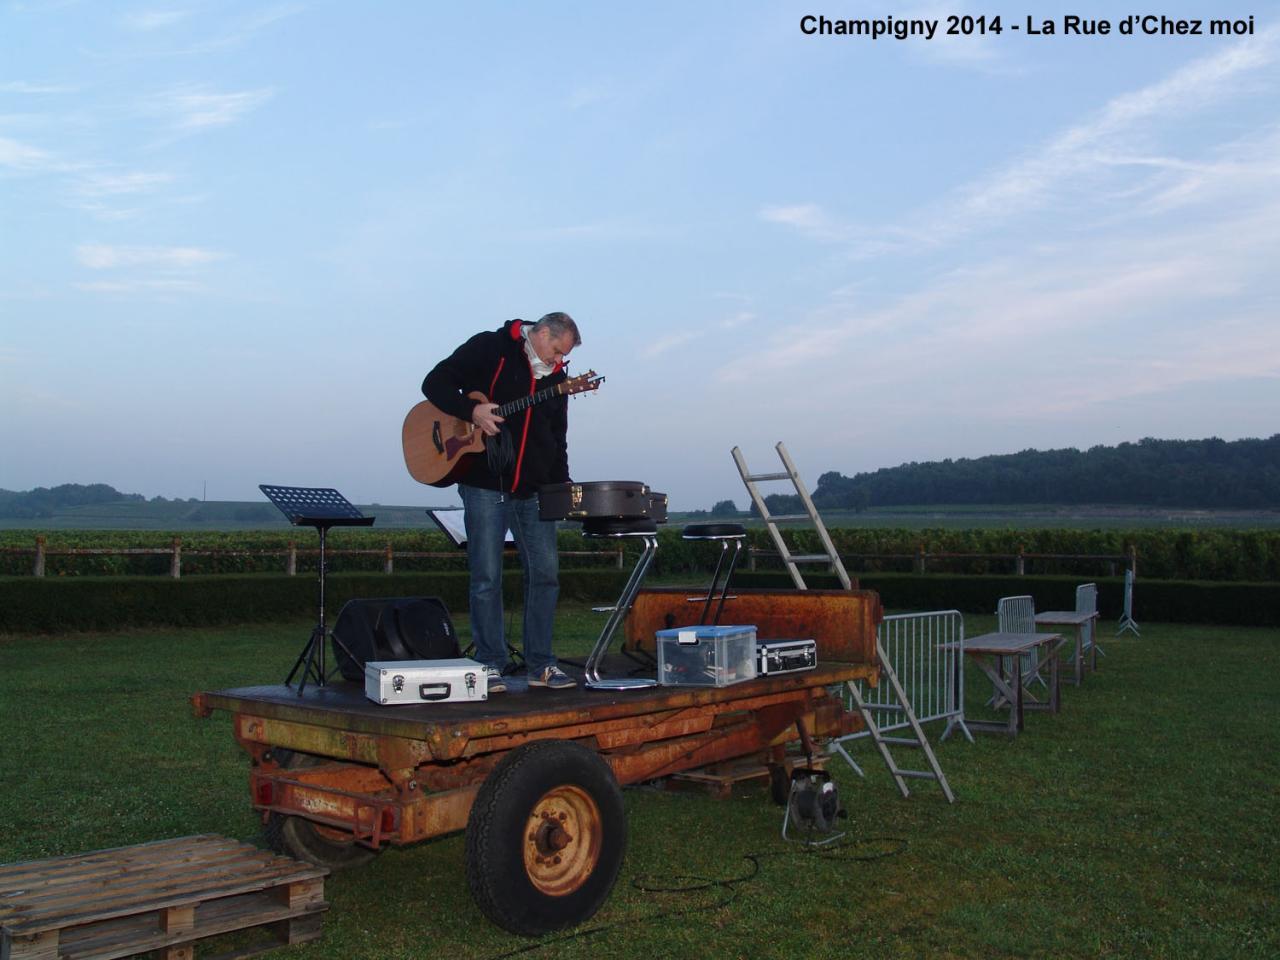 Champigny 2014 - Rue d'Chez Moi (3)